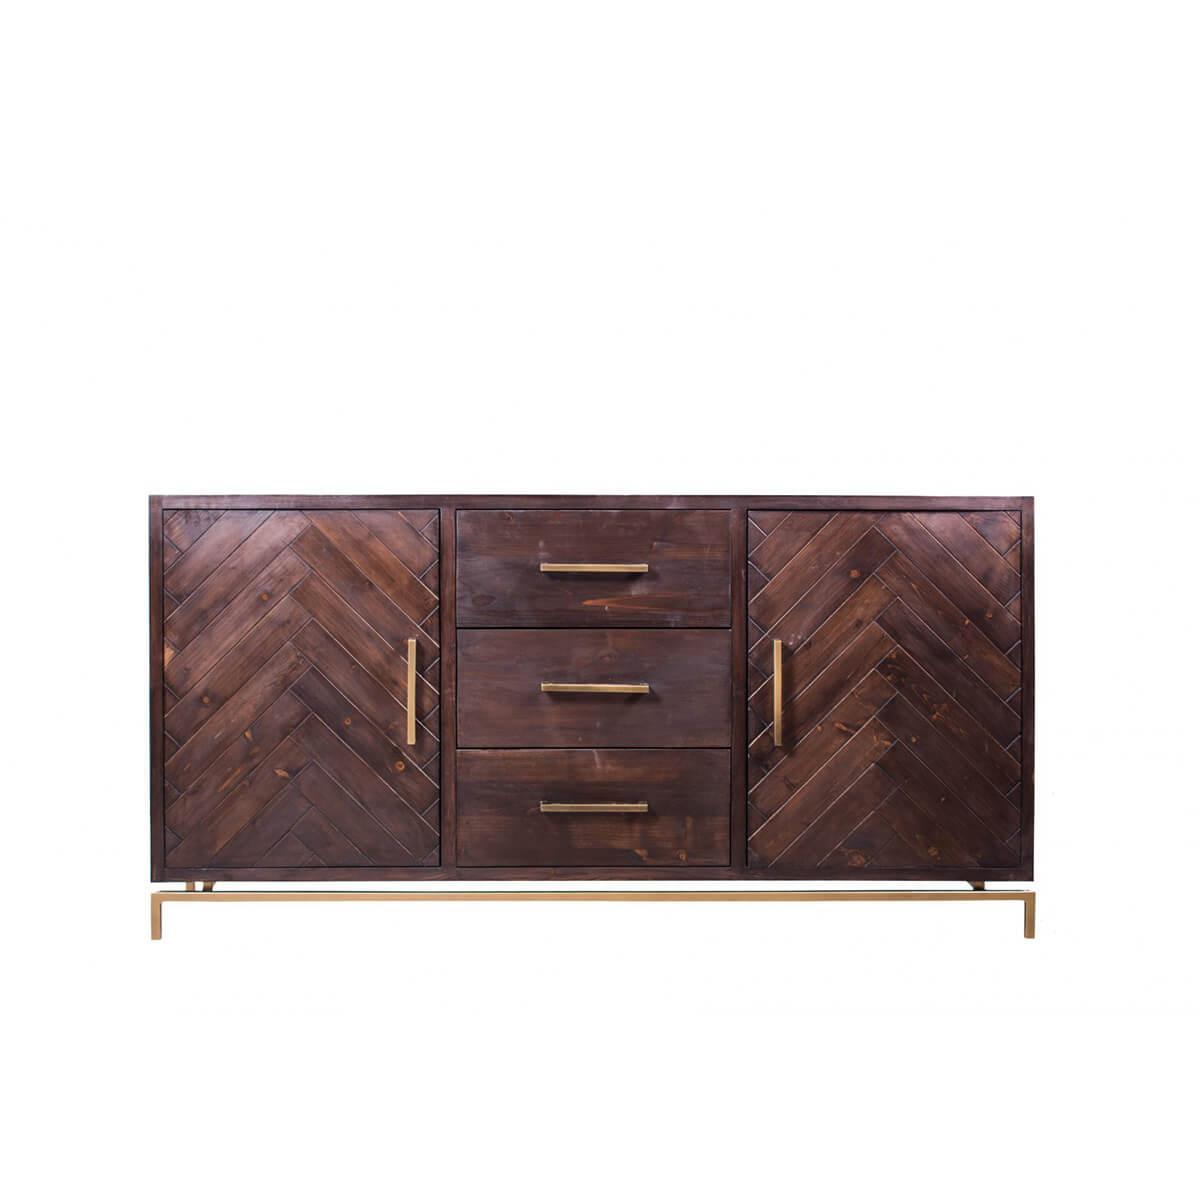 Lucien-Best-Selling-Sideboard-in-Dubai-CozyHome-Dubai